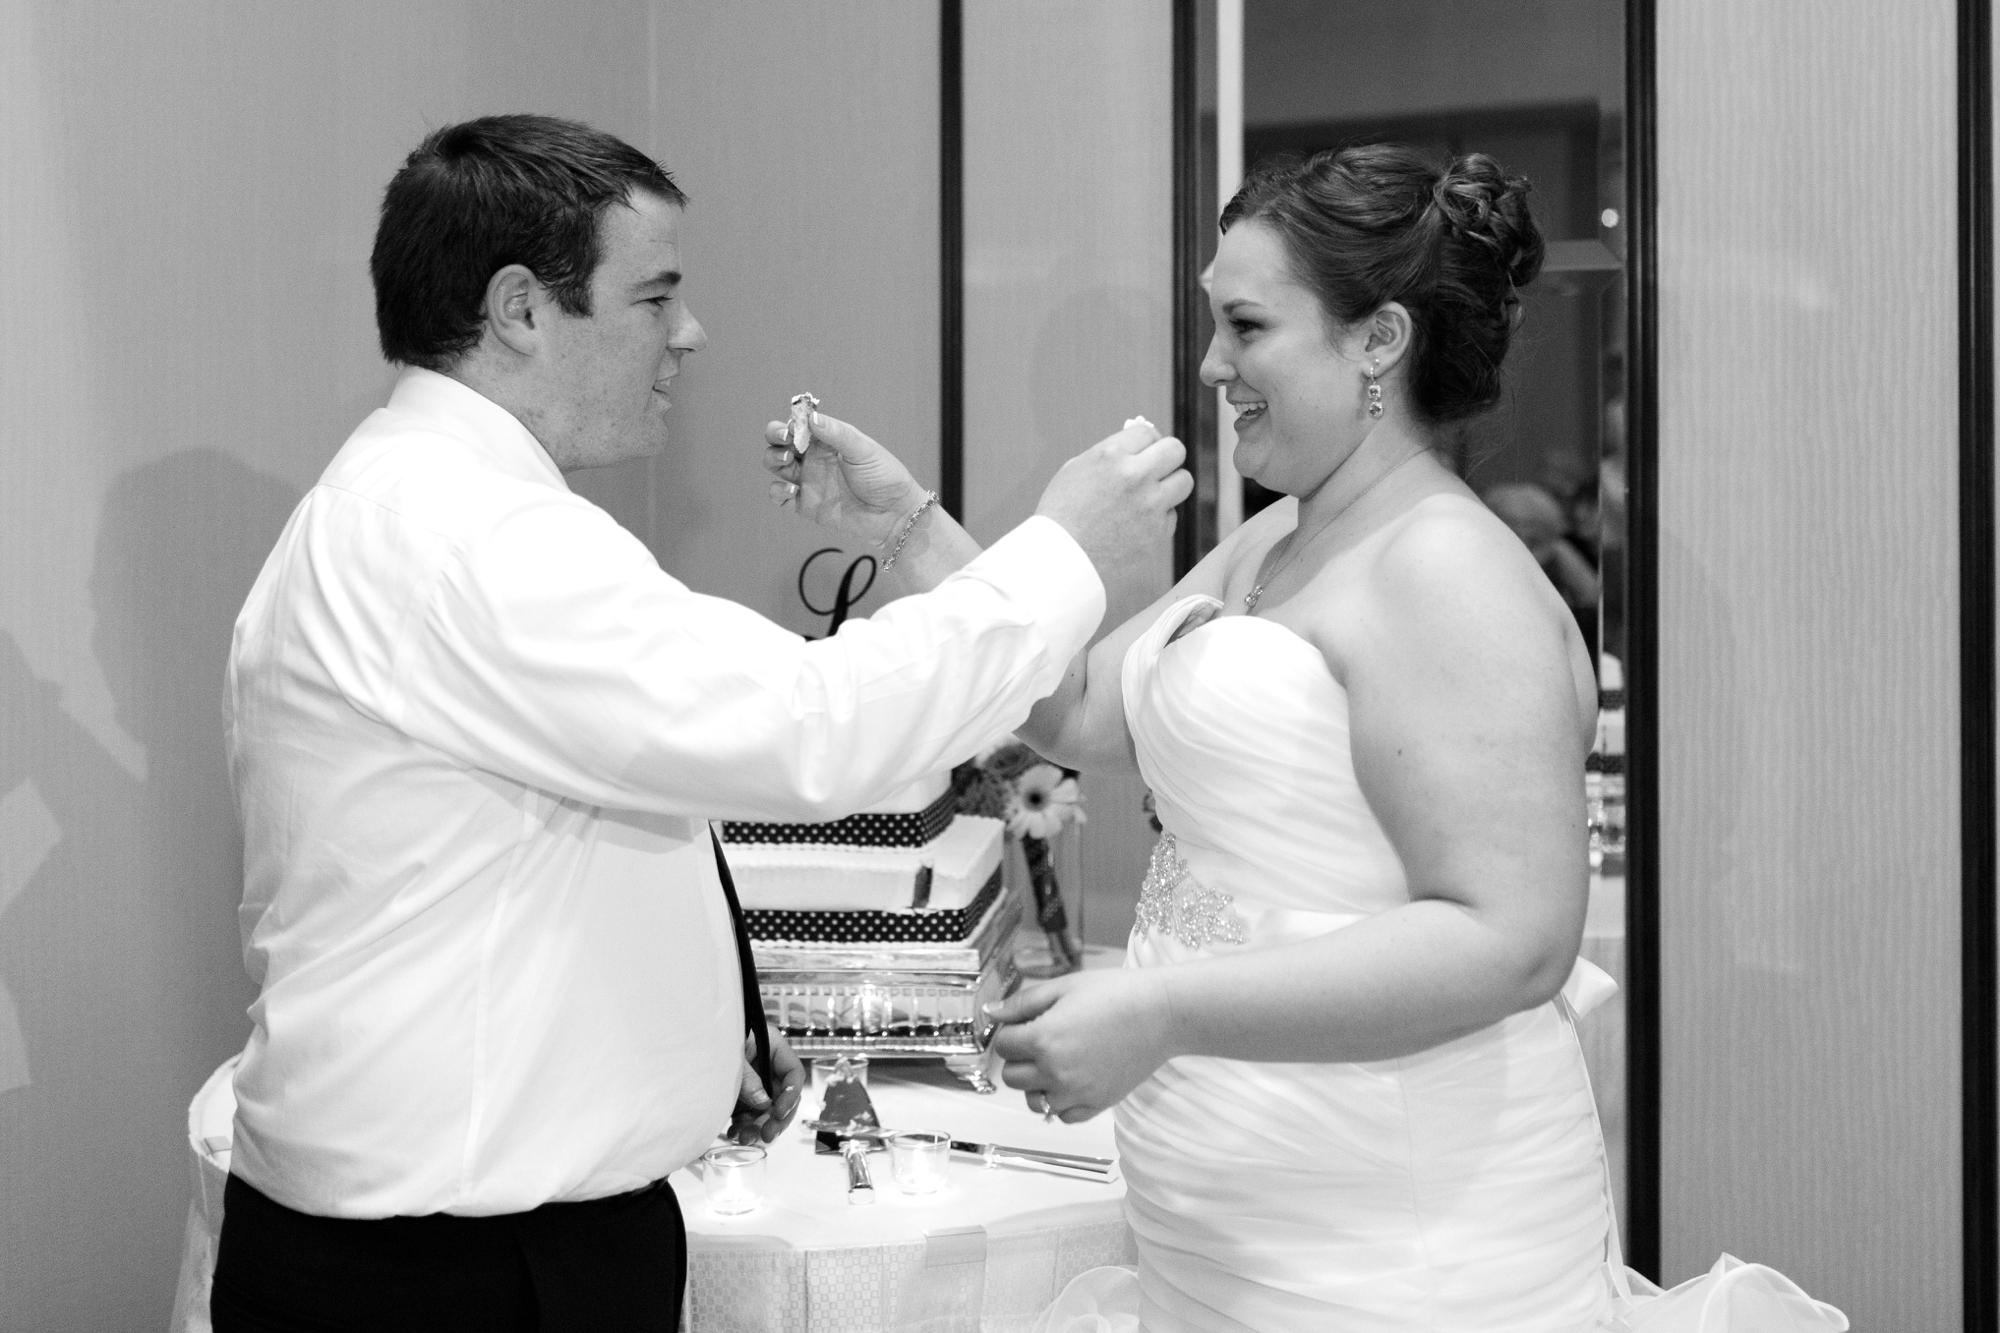 6-Lambert-Wedding-Reception-387 (deleted 2ce370aa96d0e337e20f642c289f24e5).jpg